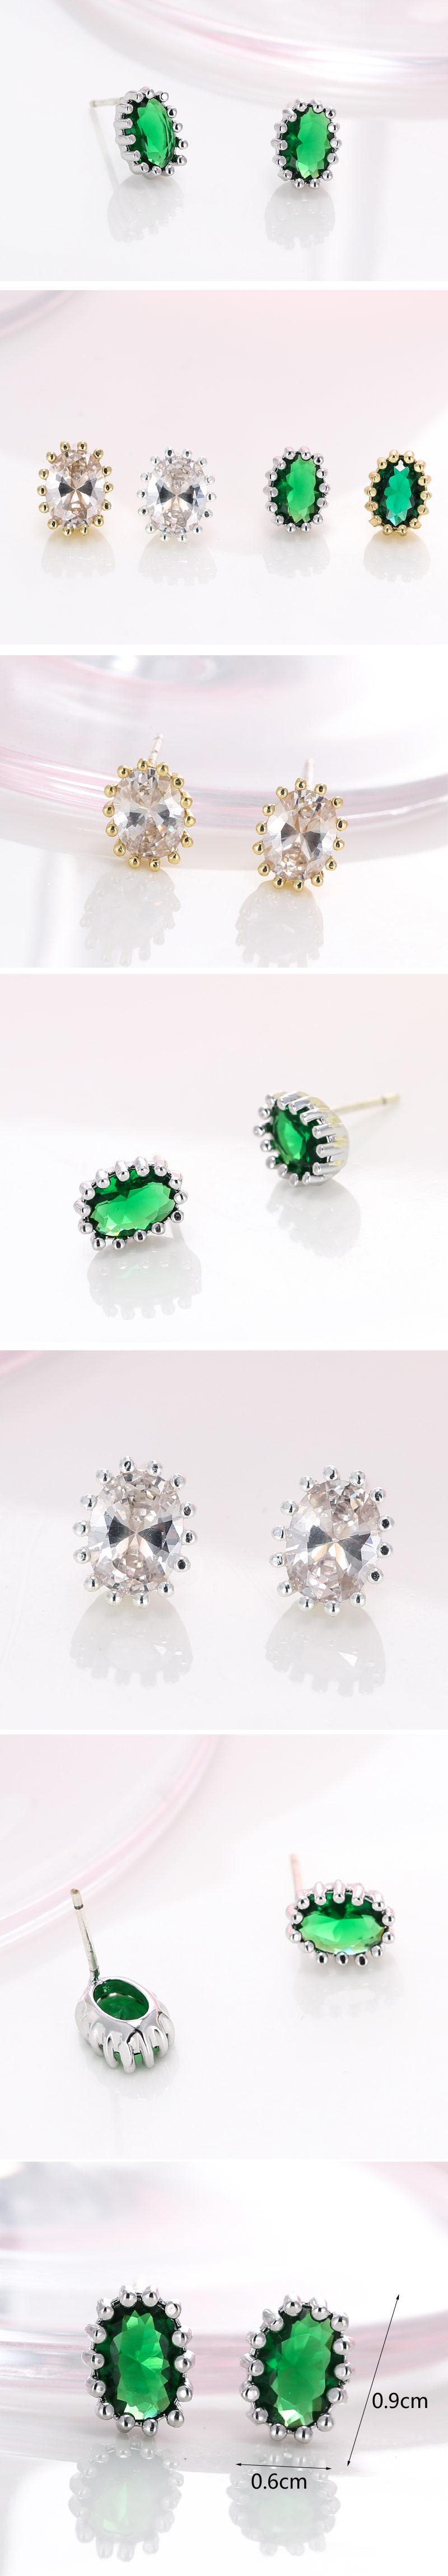 Fashion jewelry delicate Korean fashion sweet gem earrings NHSC200920